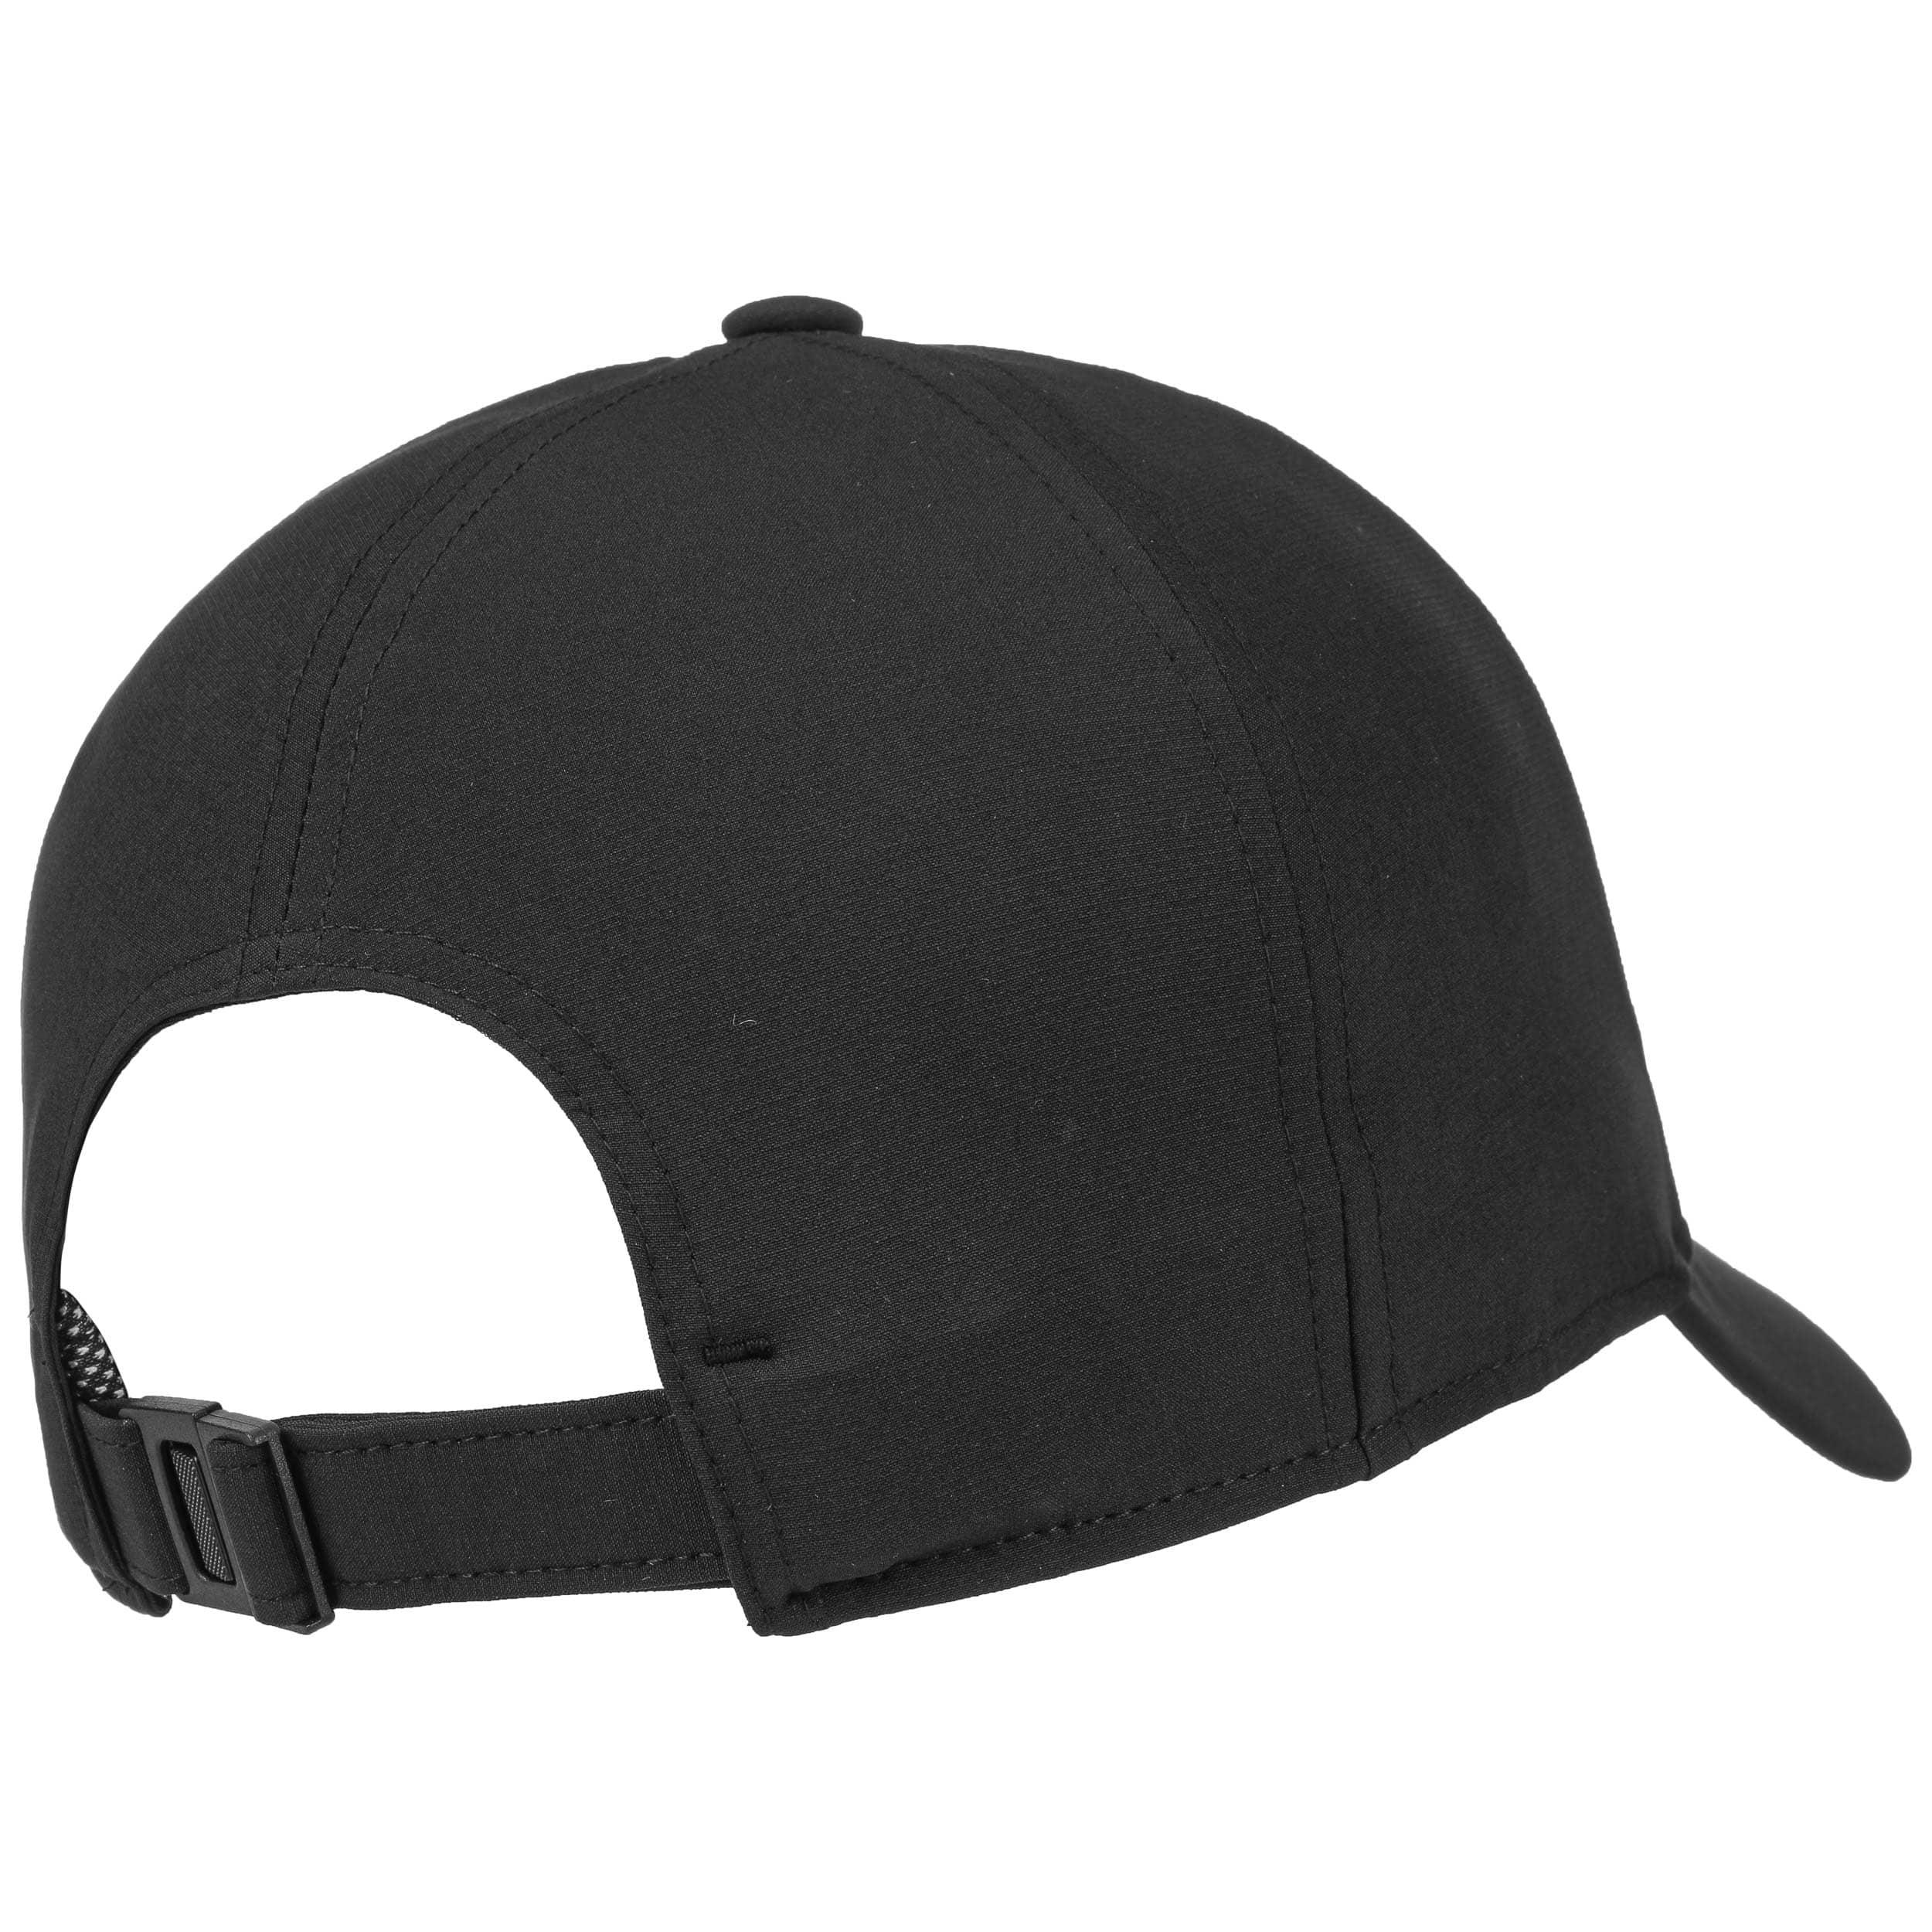 7cad99f2 ... C40 6P 3S Climalite Cap by adidas - black 3 ...